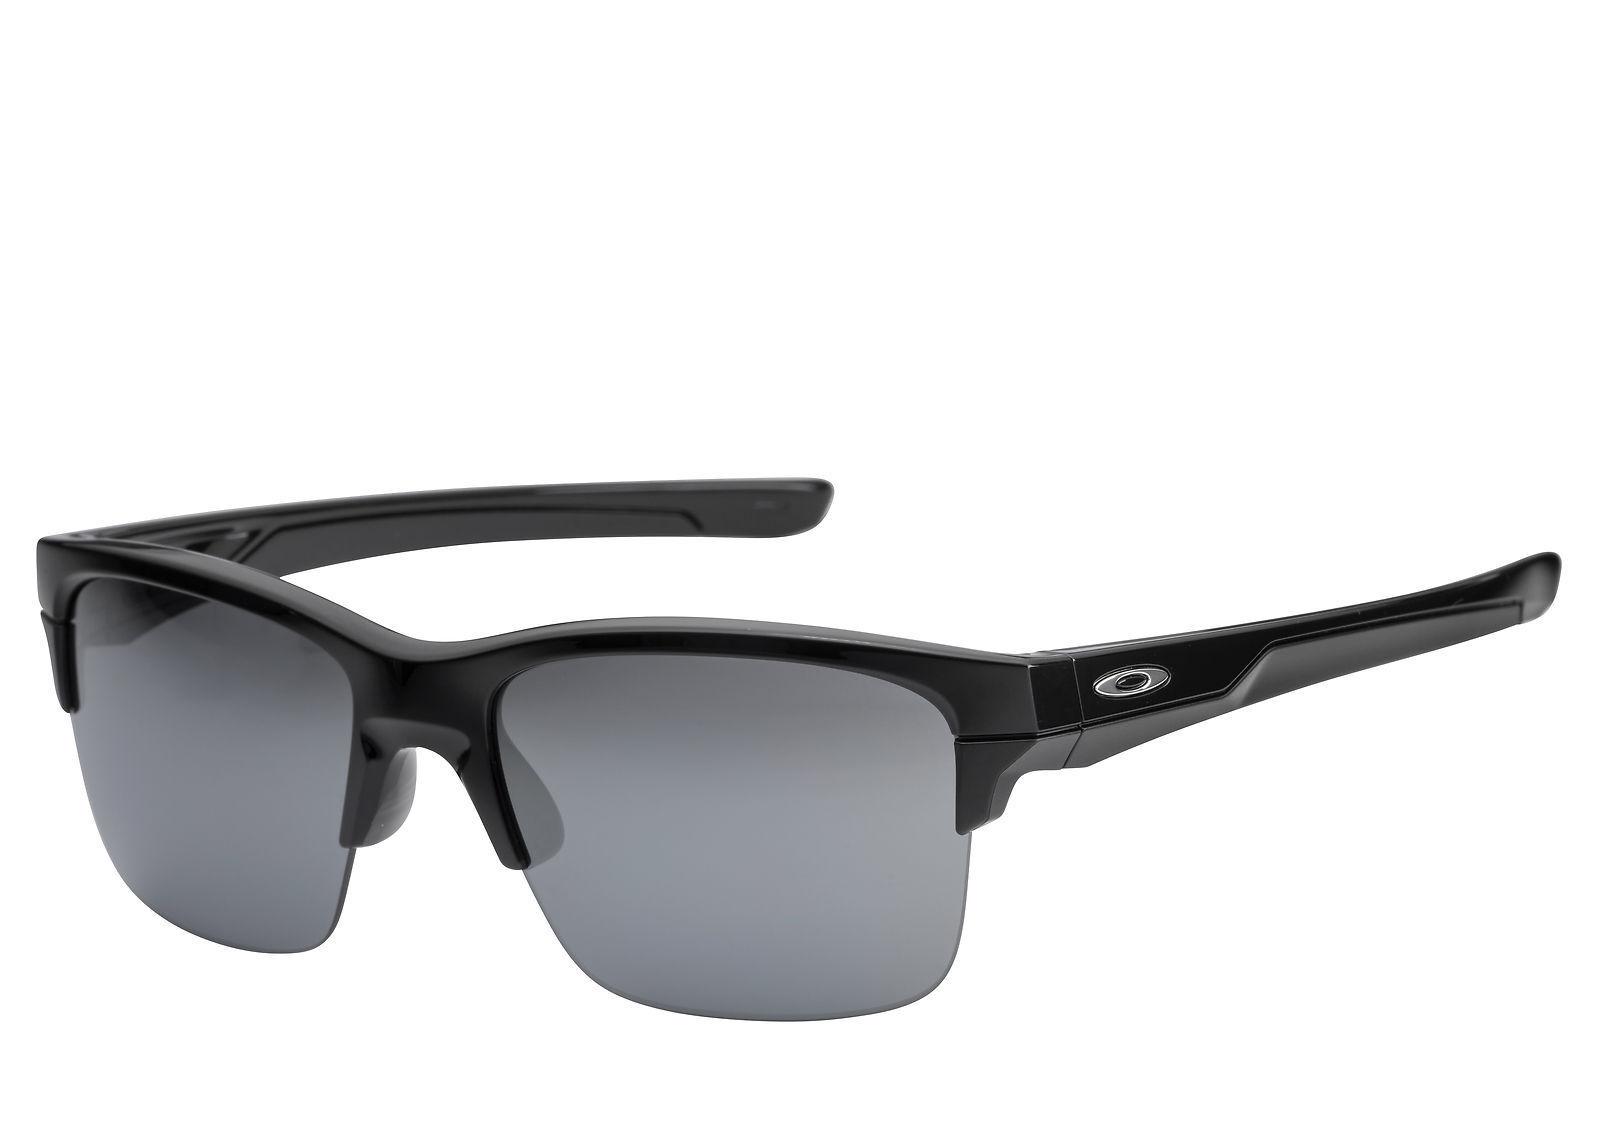 d441ddebb3 Oakley USA Semi Rimless Thinlink Polished Iridium Black Sunglasses OO9316-03